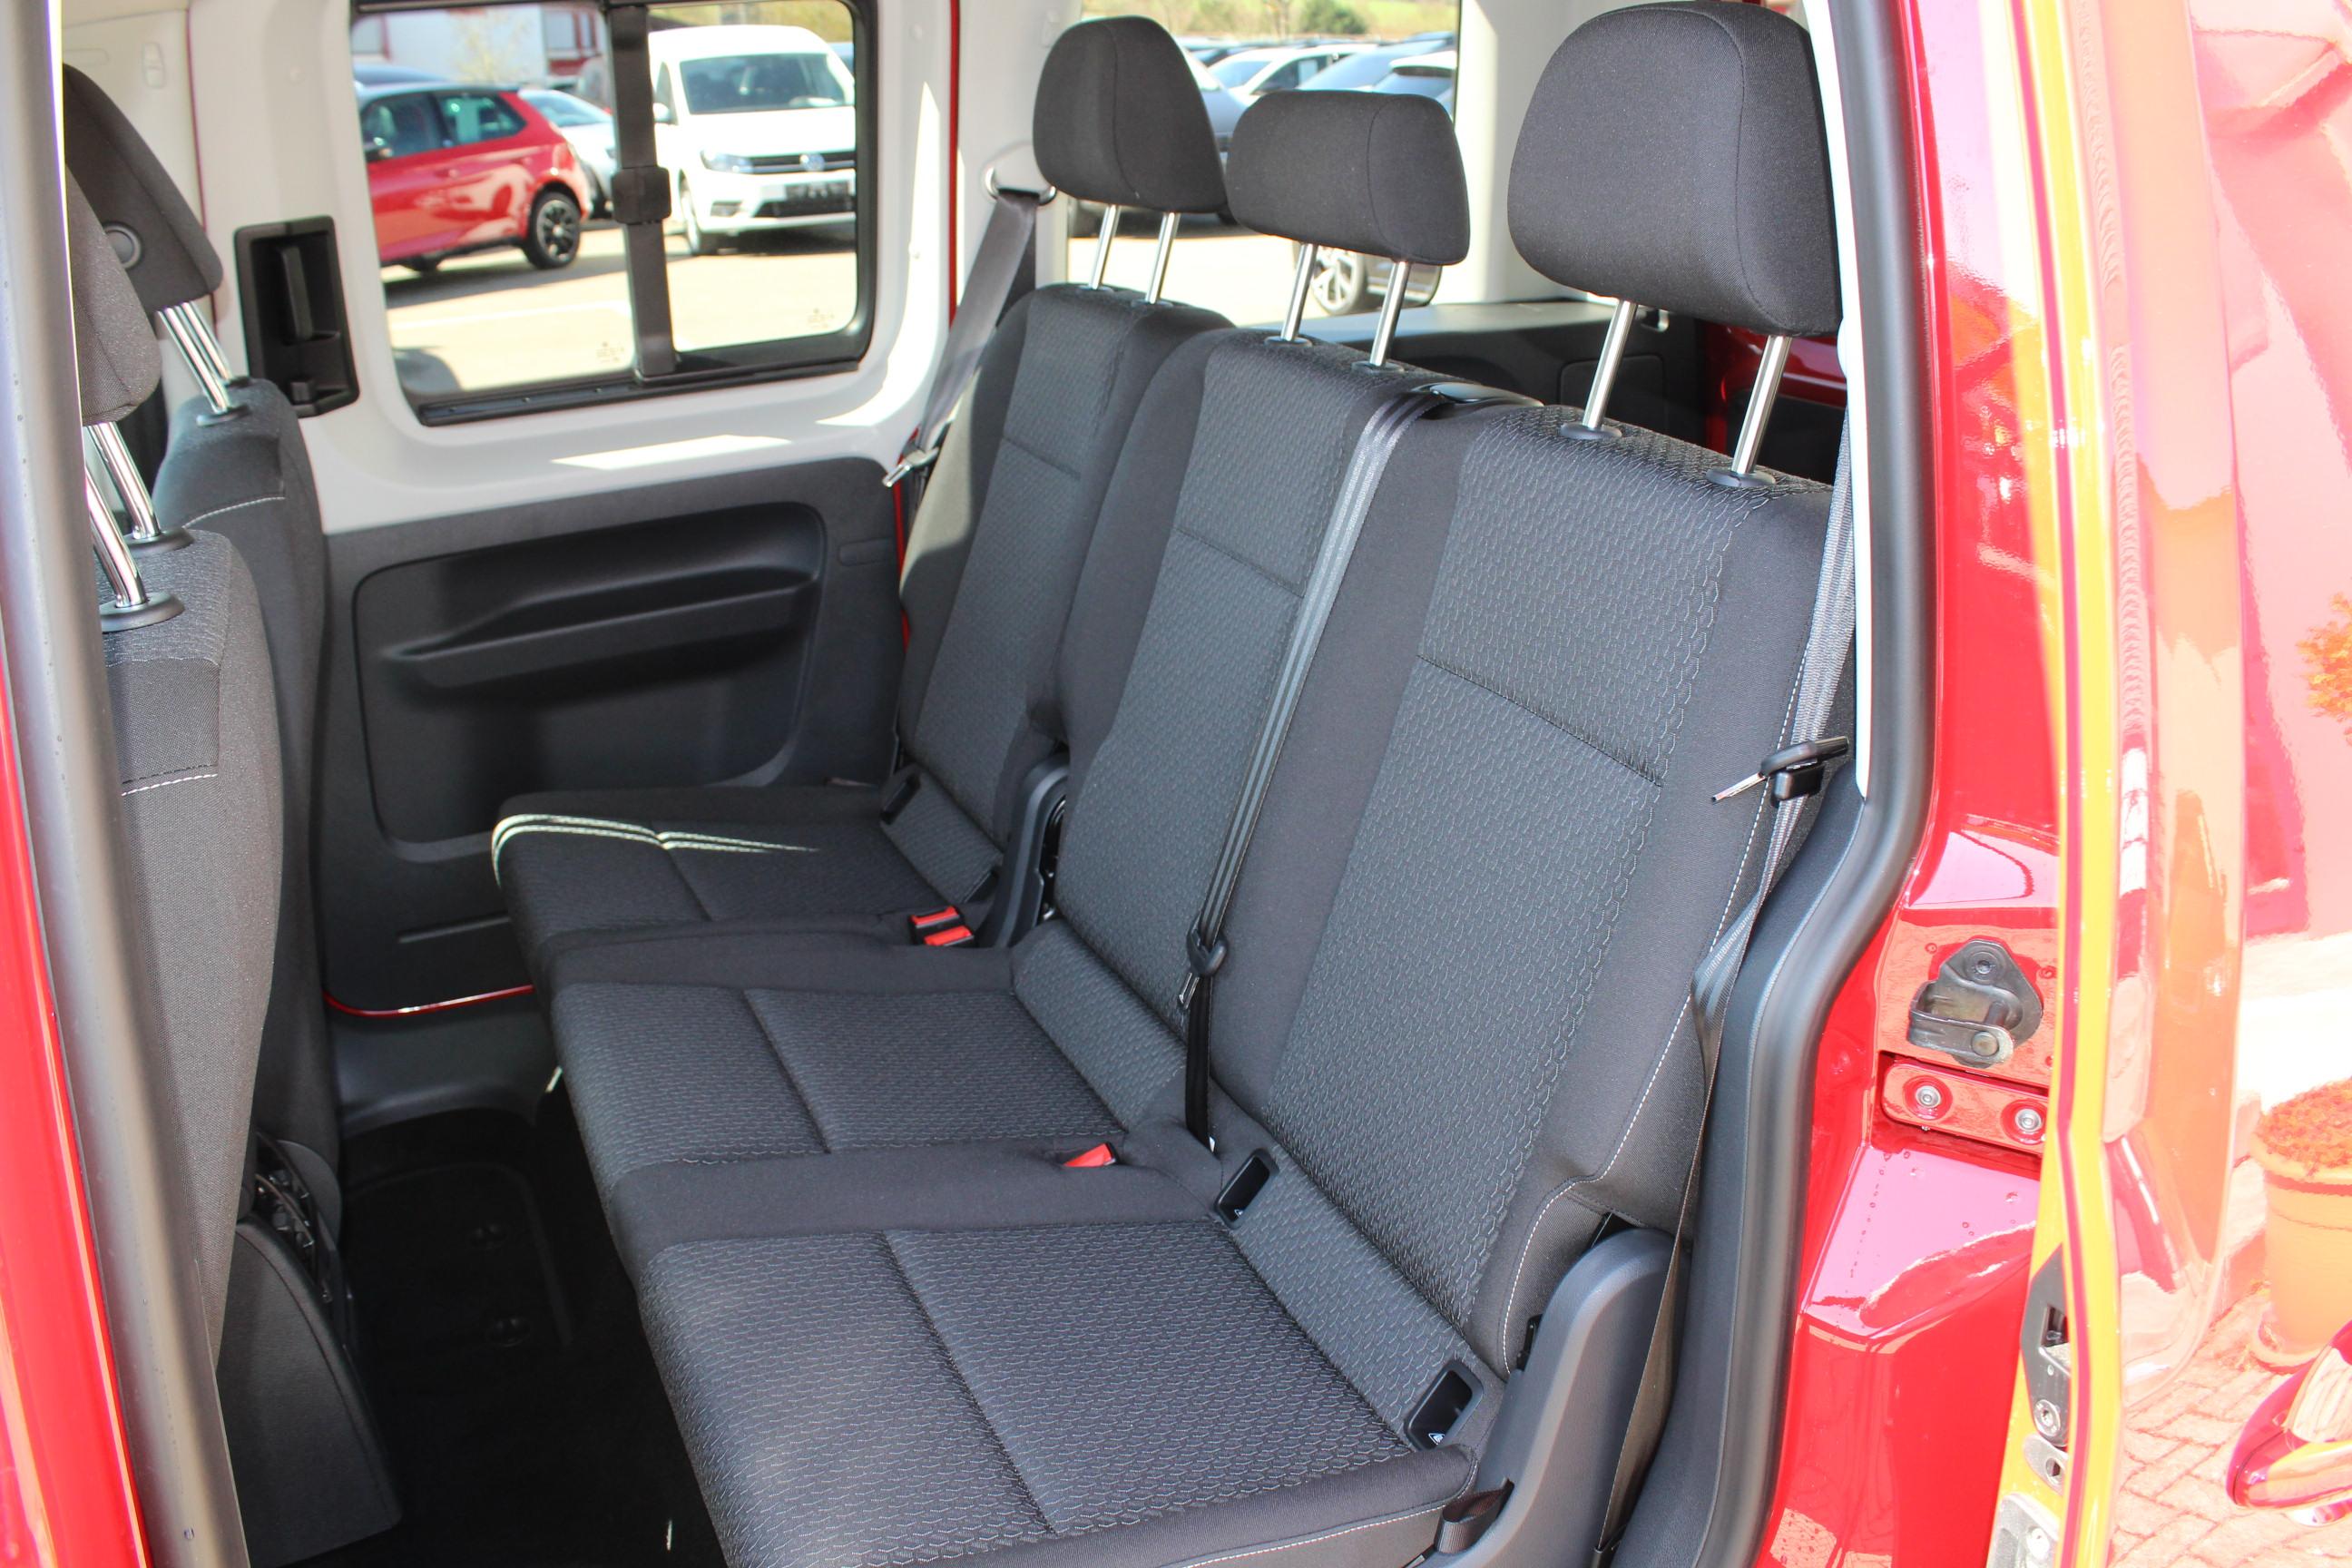 VW Caddy Trendline 1.4 TSI 6-Gang / Deutsche Neufahrzeuge und EU-Neufahrzeuge – Aha! Fahrzeughandel GmbH in Althengstett